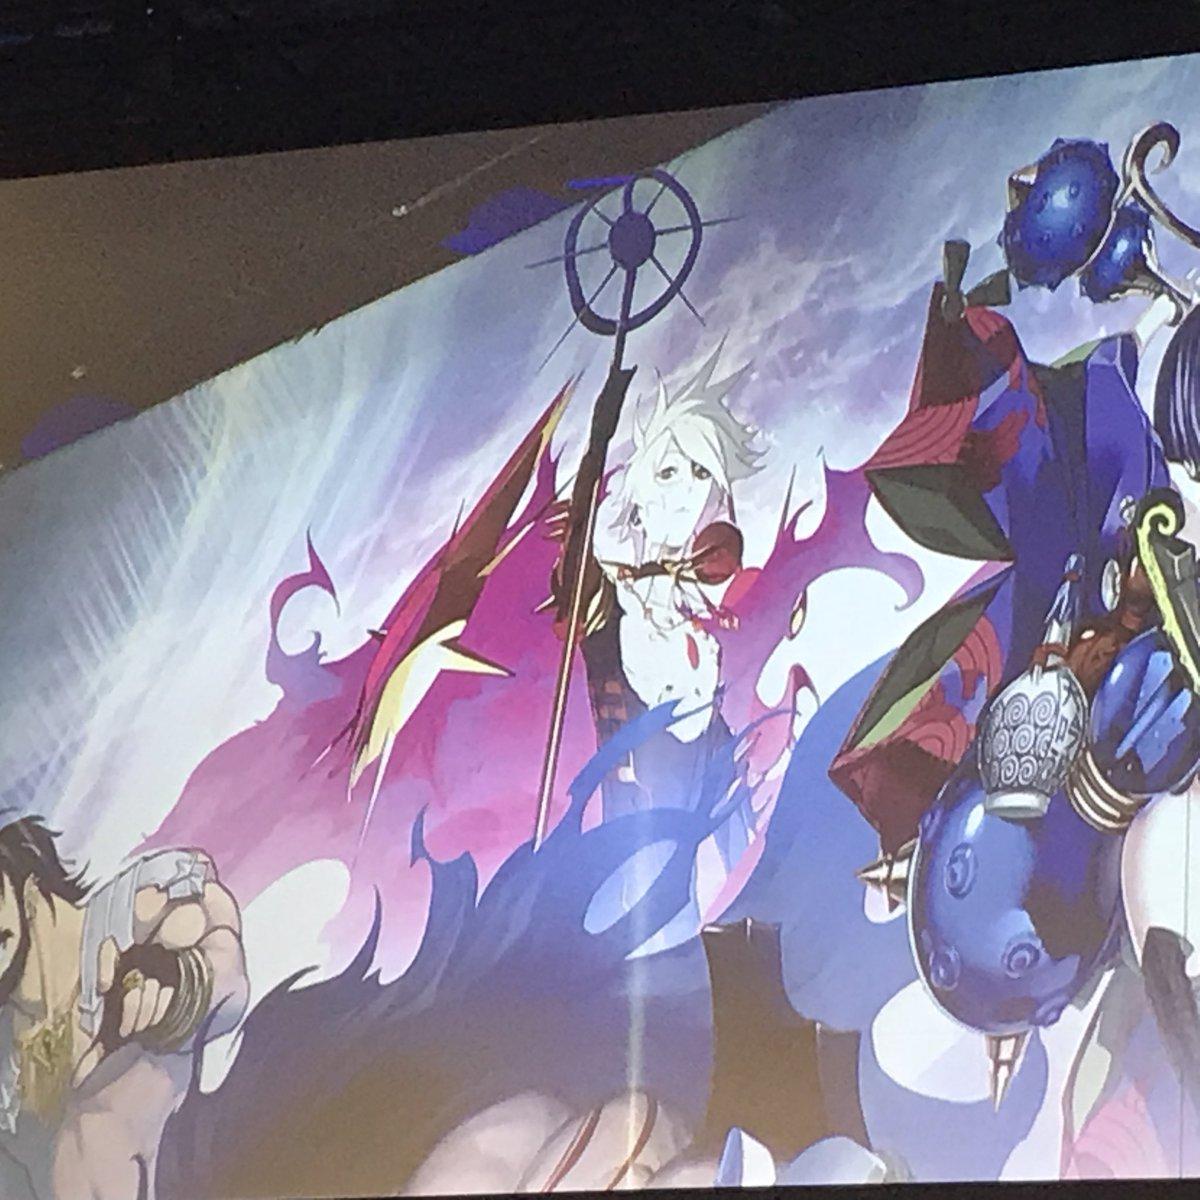 「FGO Arcade 発表会」 キービジュにカルナ!!!! #fgo